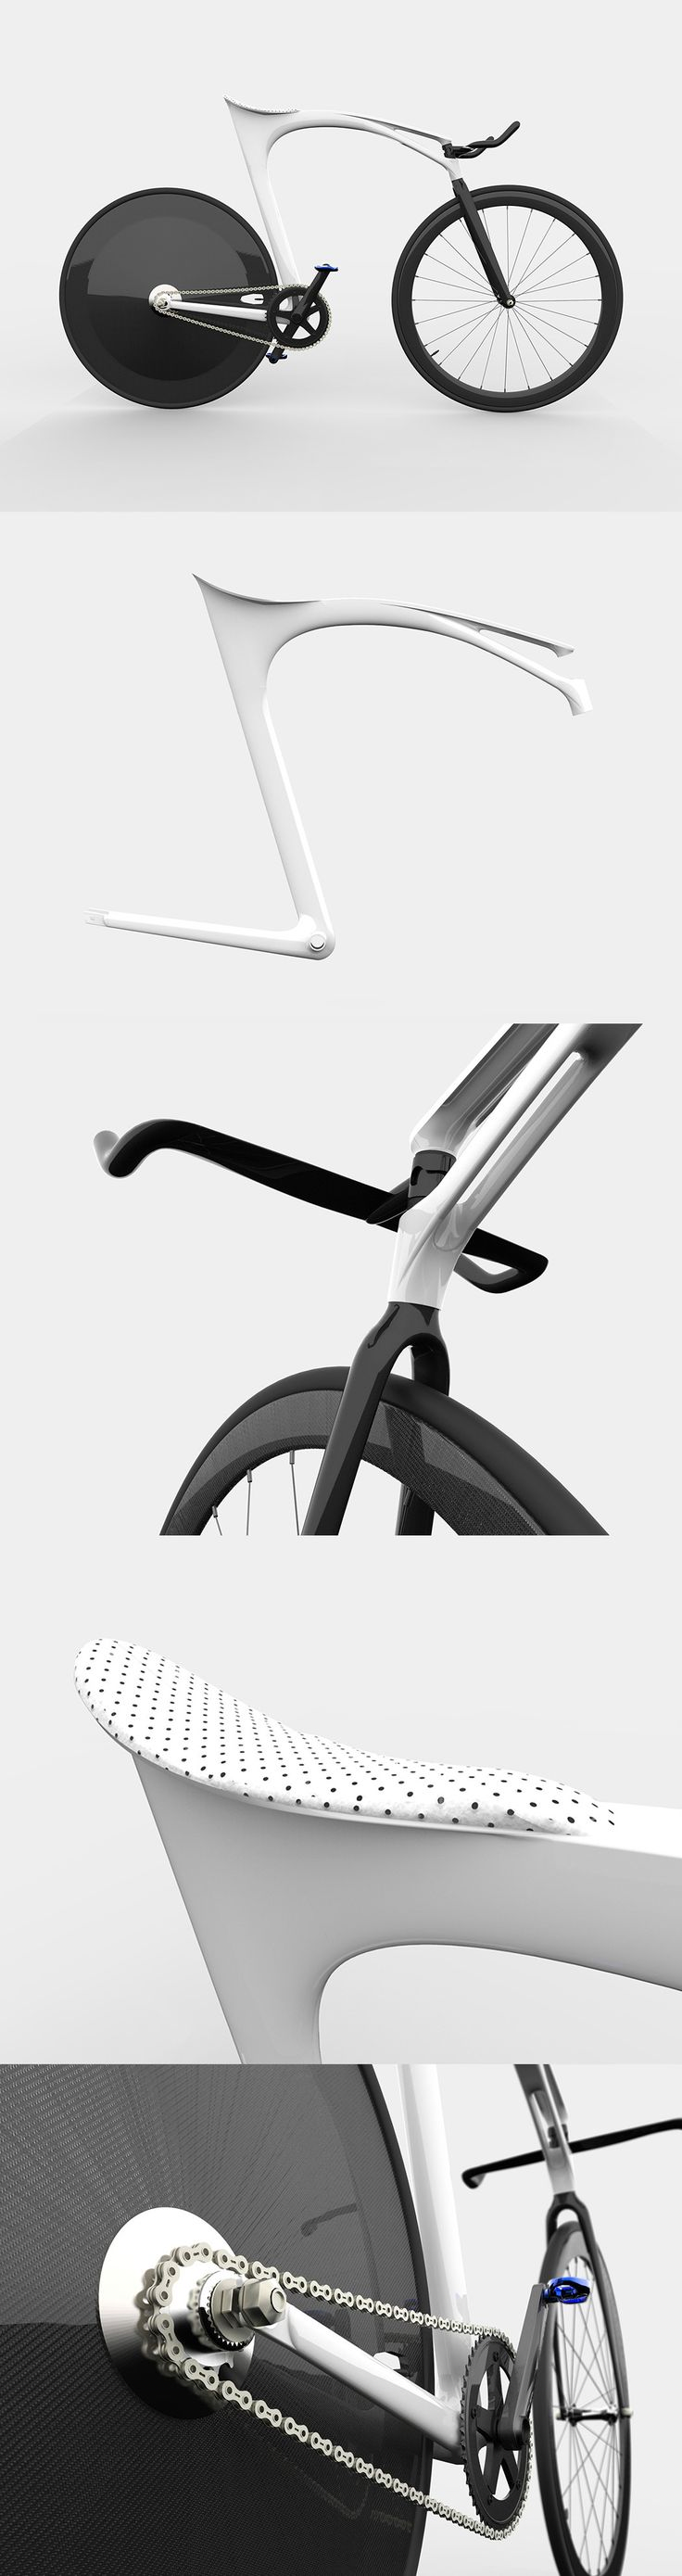 FAR-OUT FIXIE... Read more at Yanko Design Design,Bicicletas,Bikes,Blog do Mesquita XI www.mesquita.blog.br  www.facebook.com/mesquita/fanpage